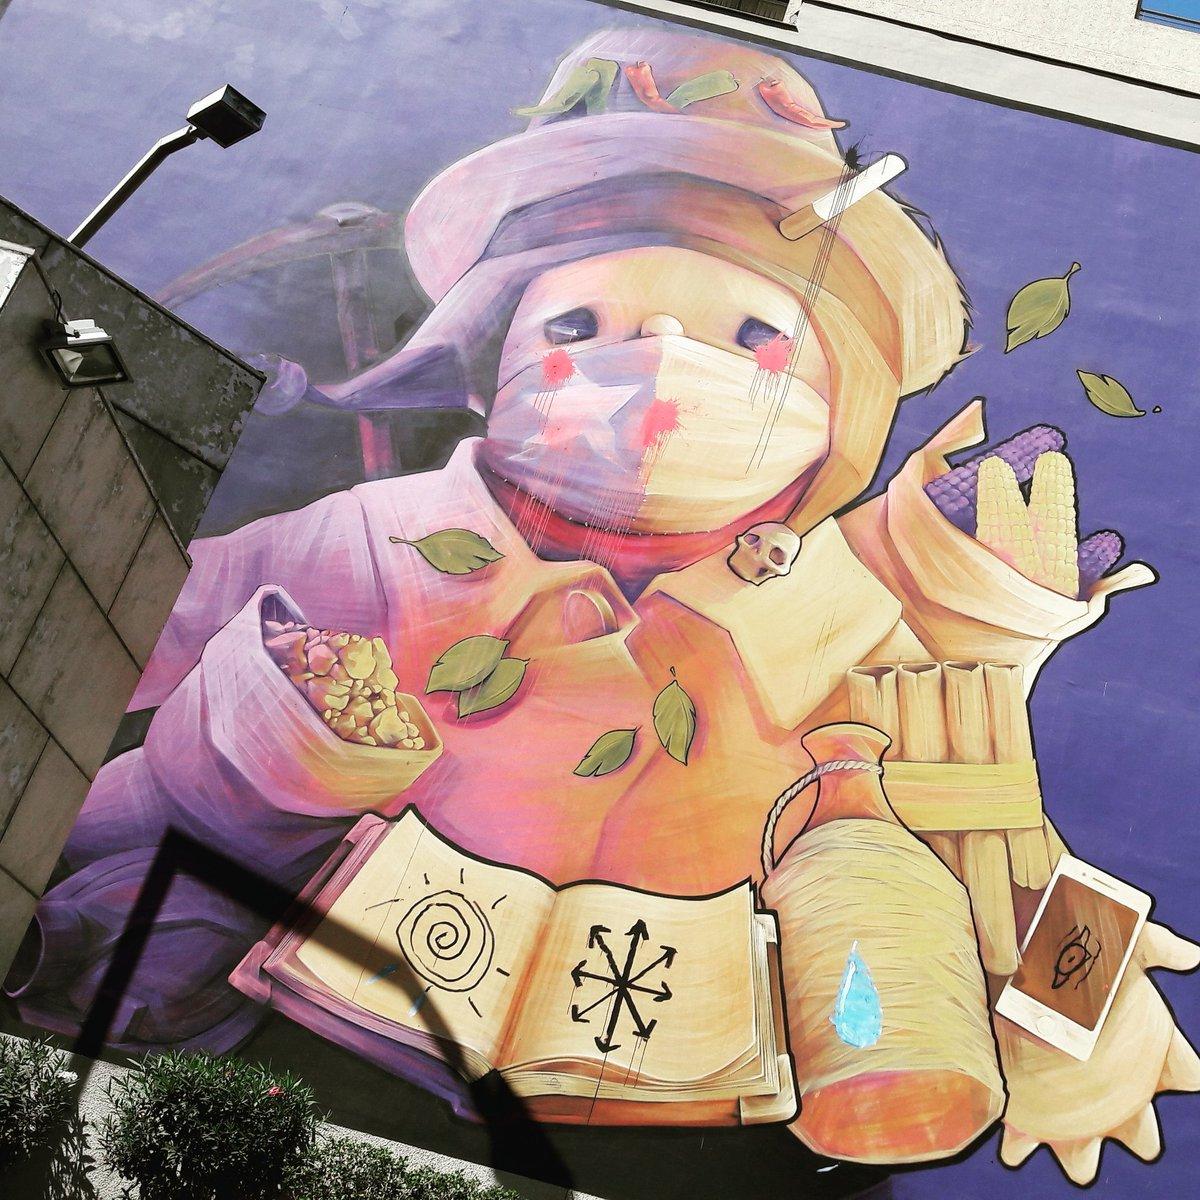 Sympa les sorties de métro au #chili #inti #intiartist #santiago #arturbain #urbanart #muralisme #fresque #streep #streepart<br>http://pic.twitter.com/suq4x5GWrJ